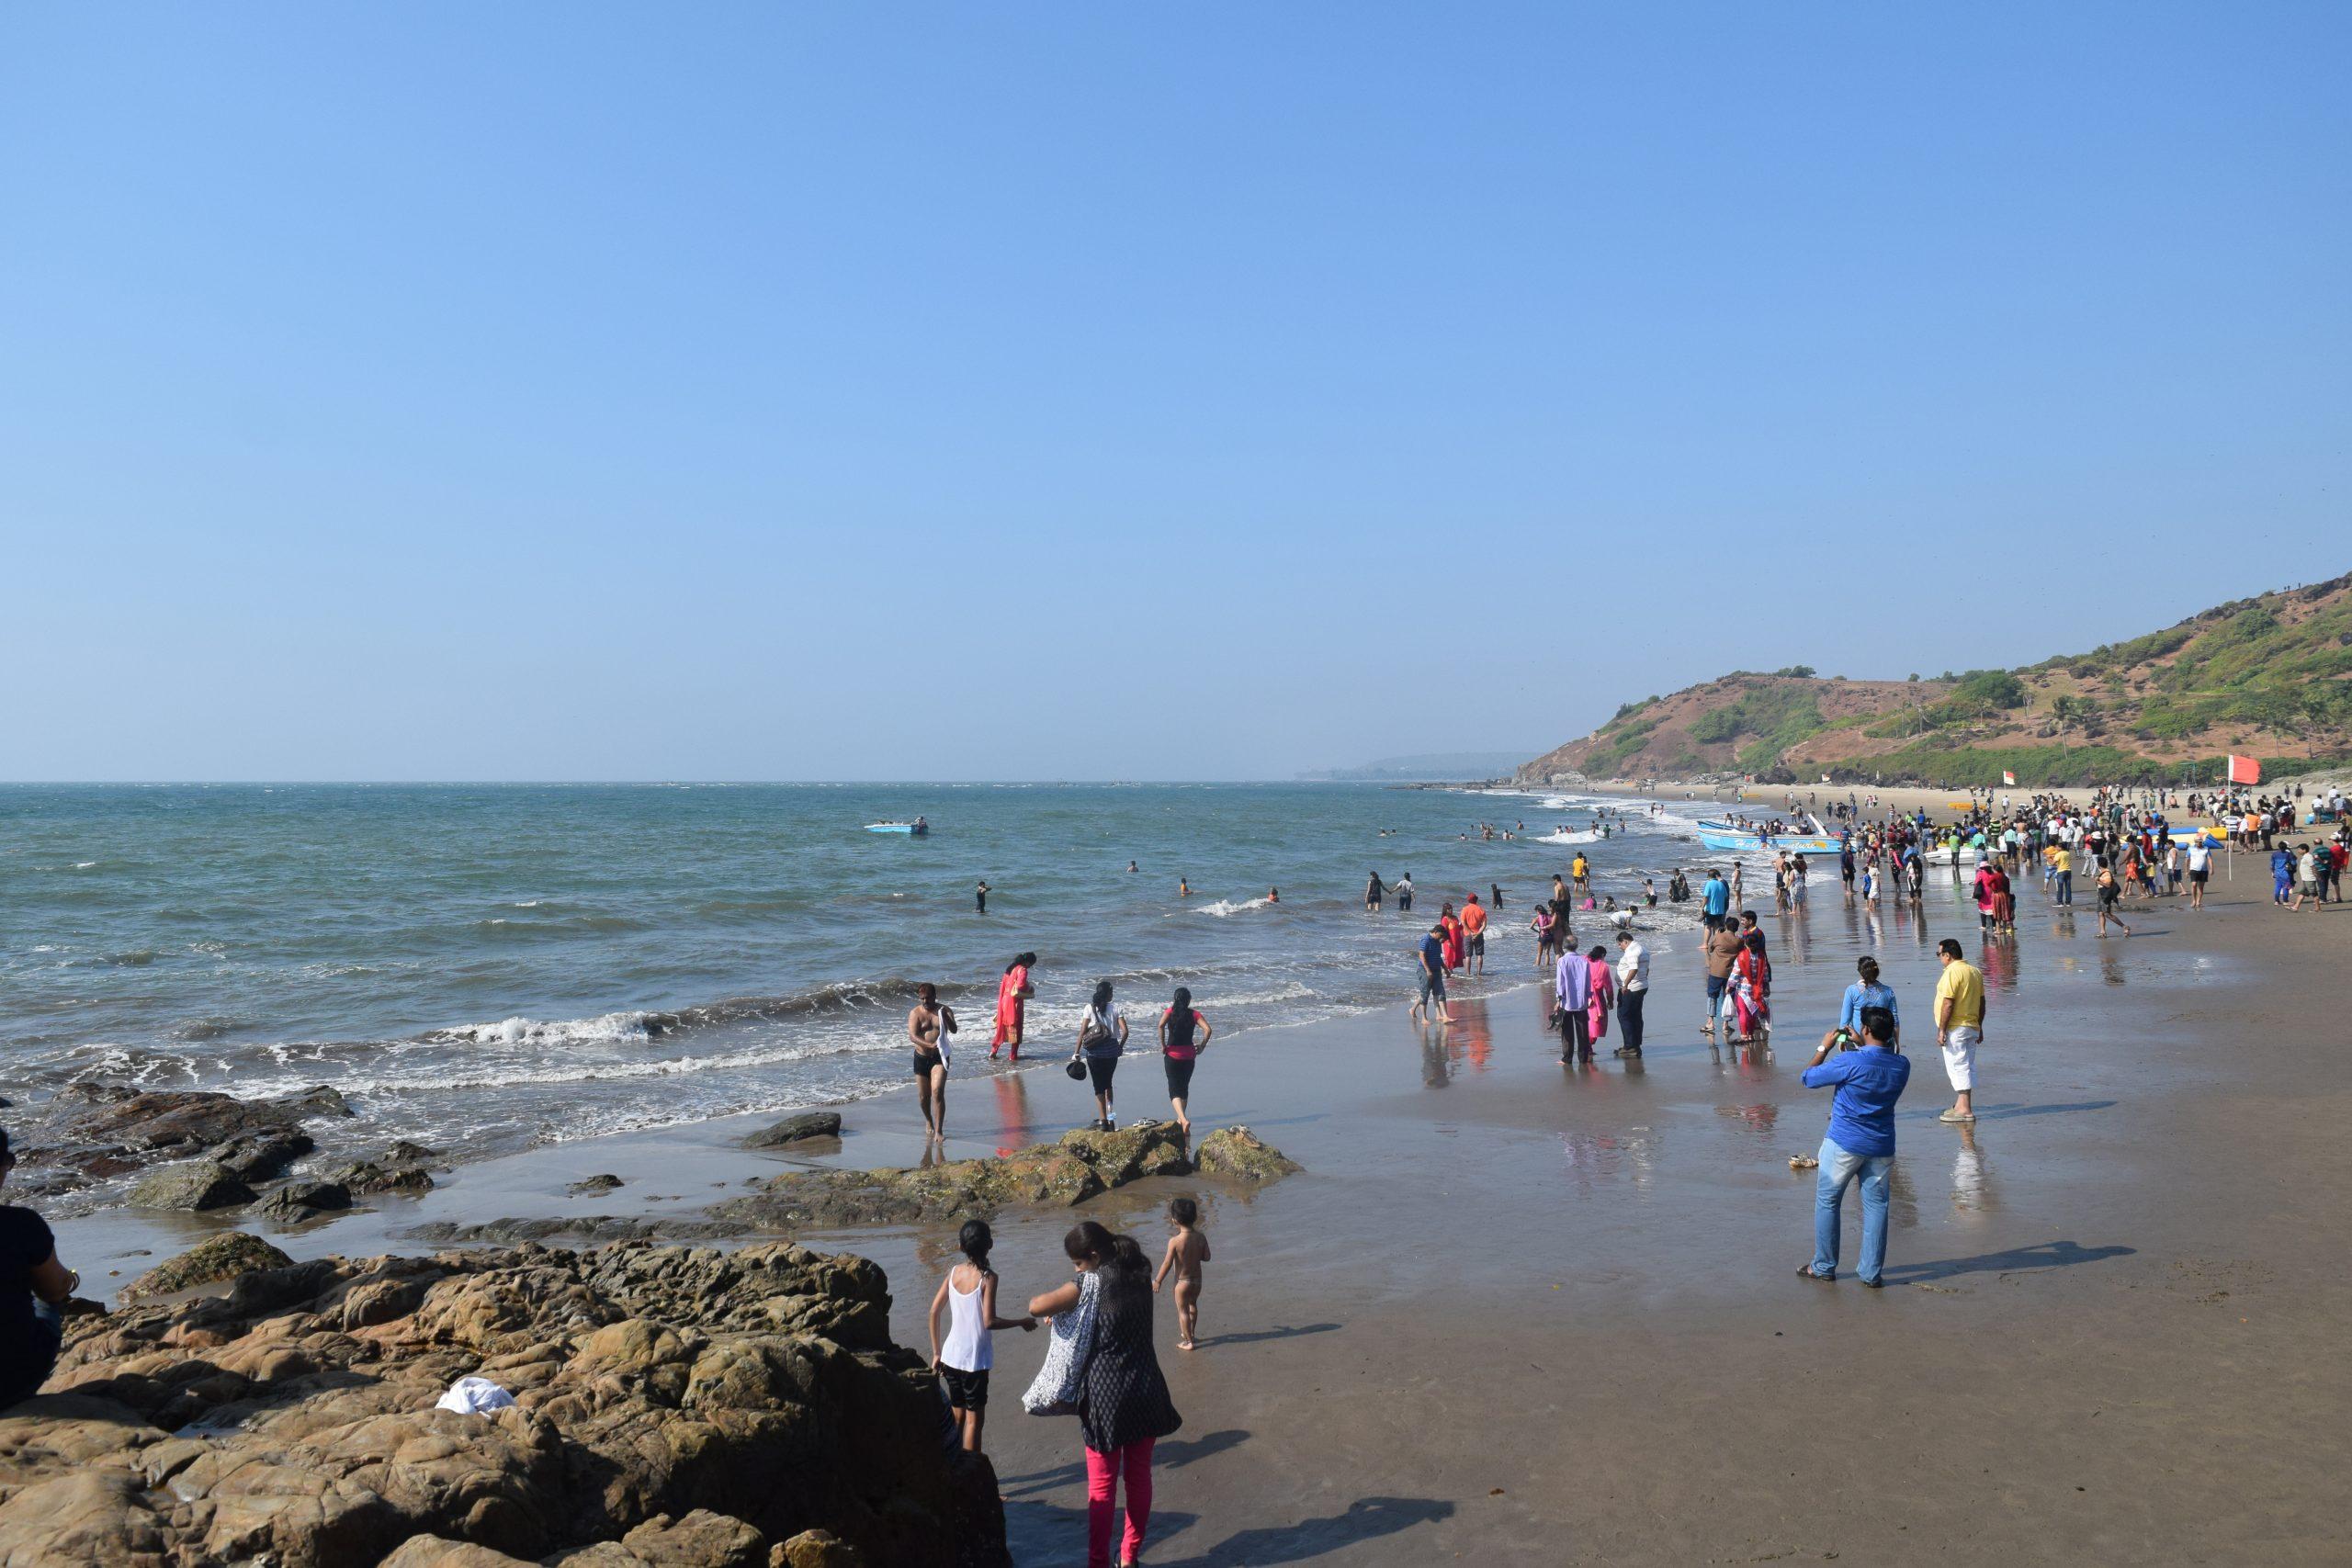 Get Some Vitamin Sea At This Best Beache in North Goa - Vagator Beach